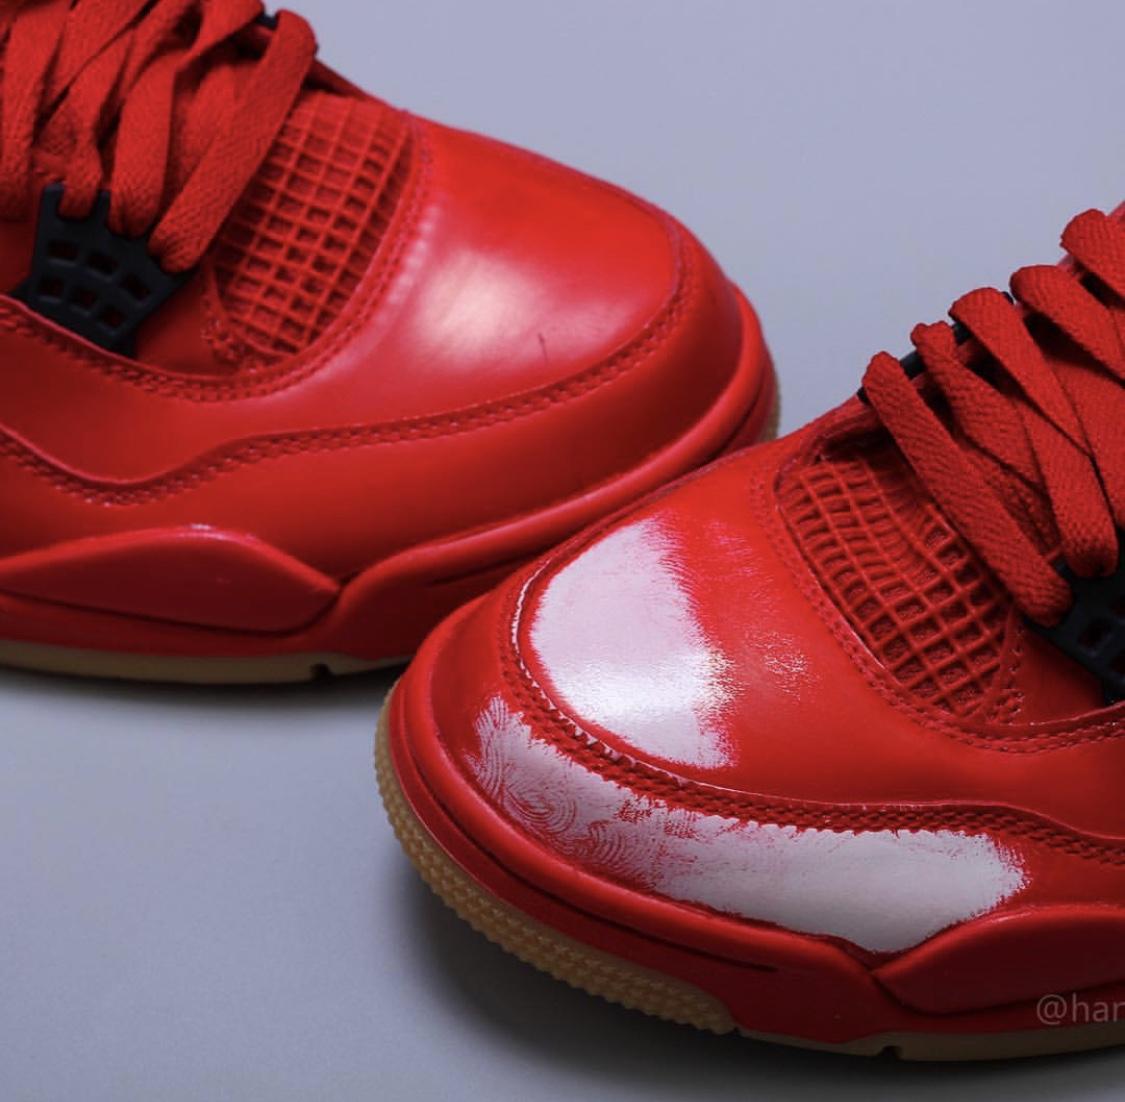 all red 4s gum bottom \u003e Up to 64% OFF